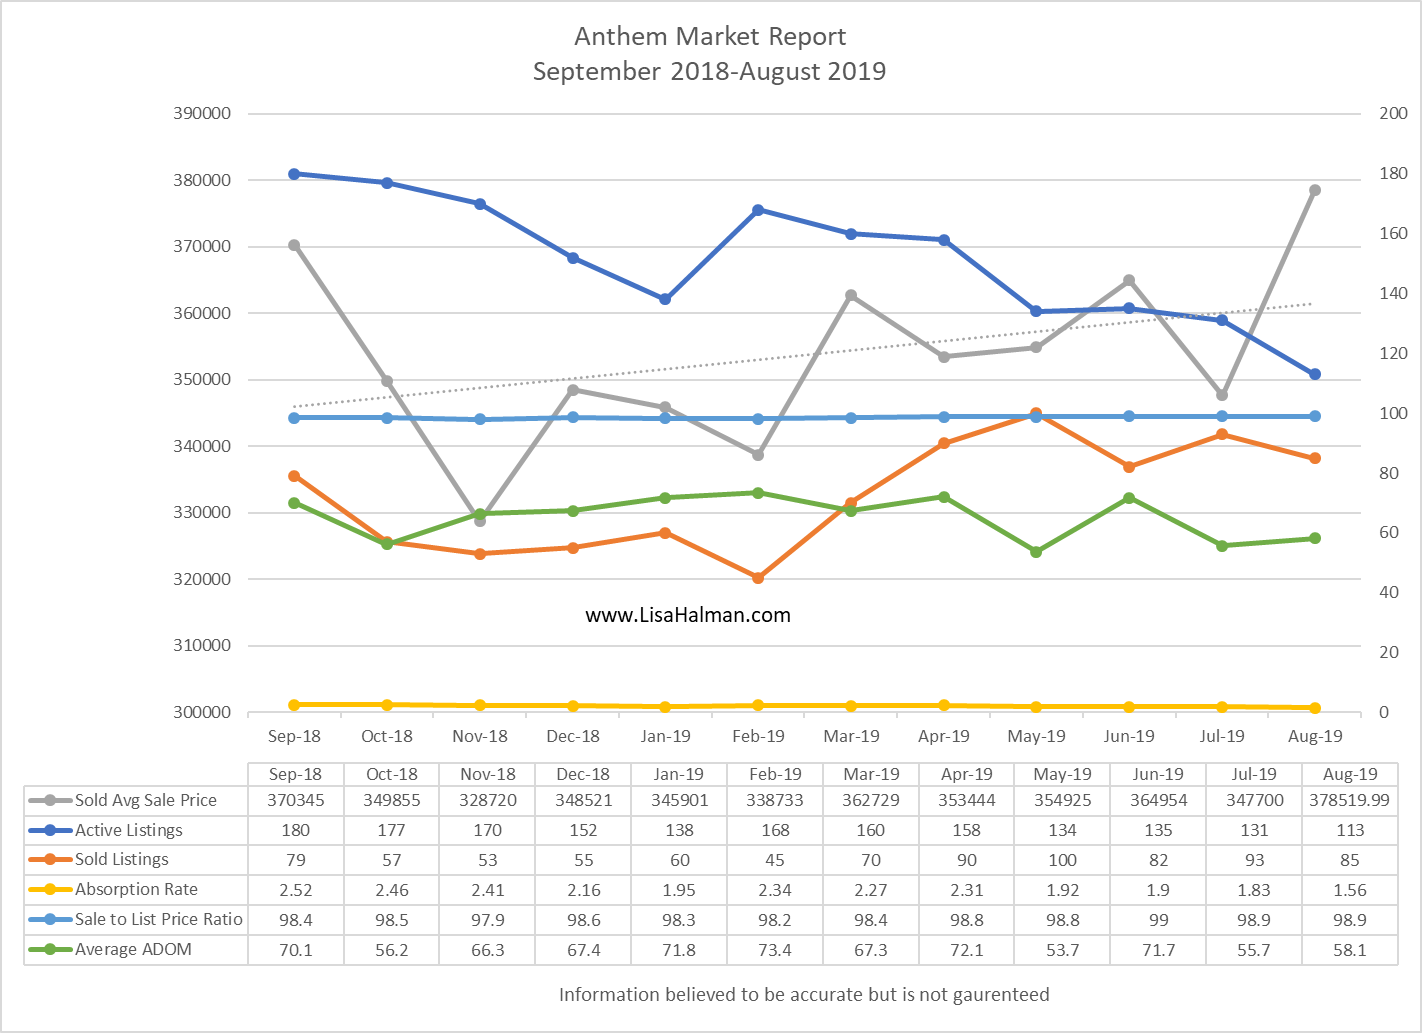 Anthem Market Report August 2019